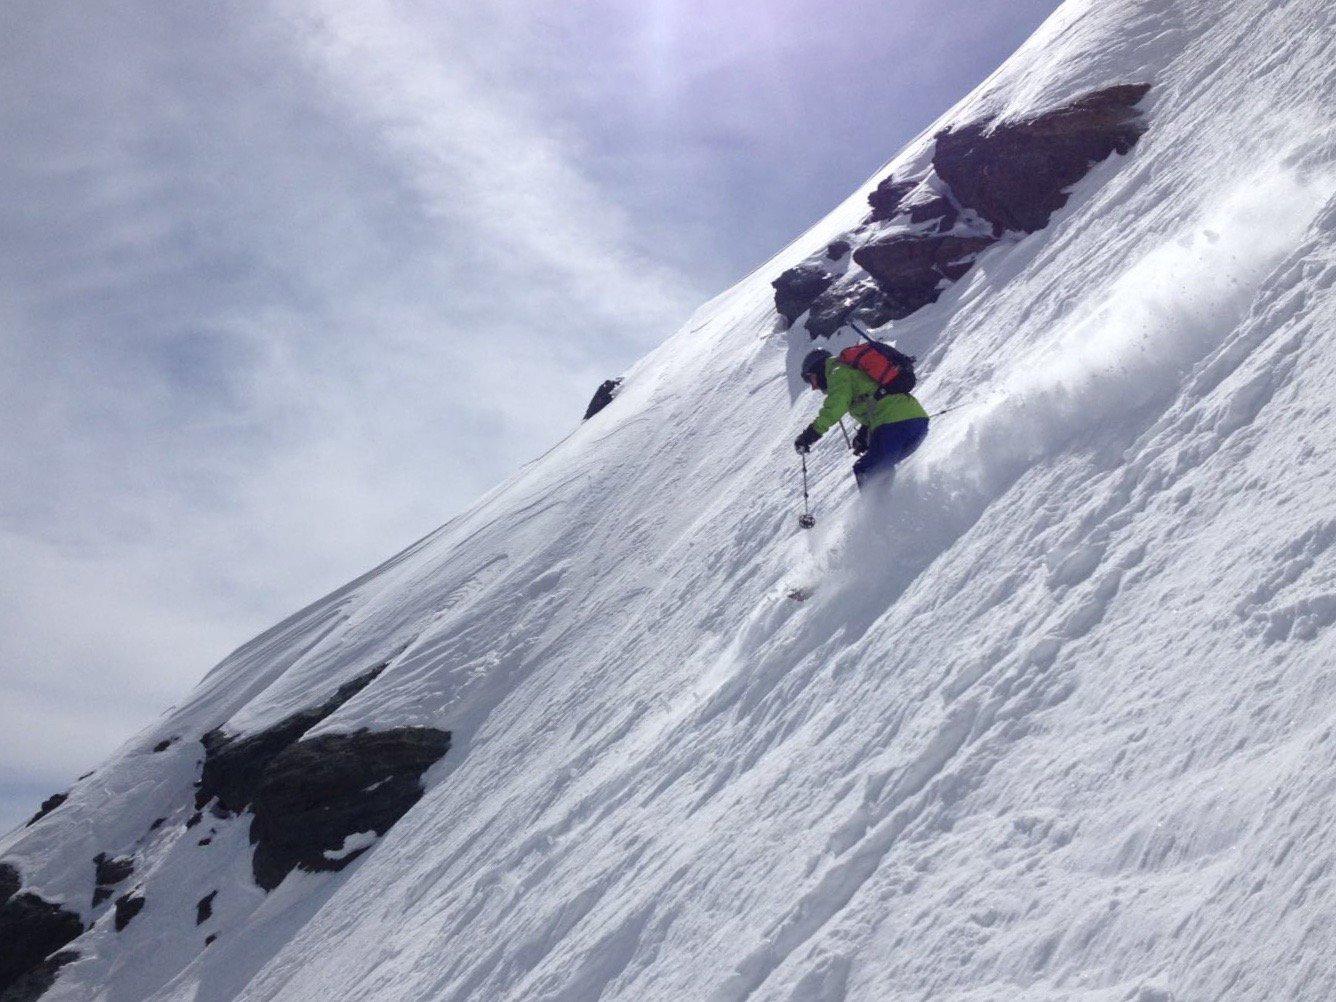 Ski de rève alla corda molle